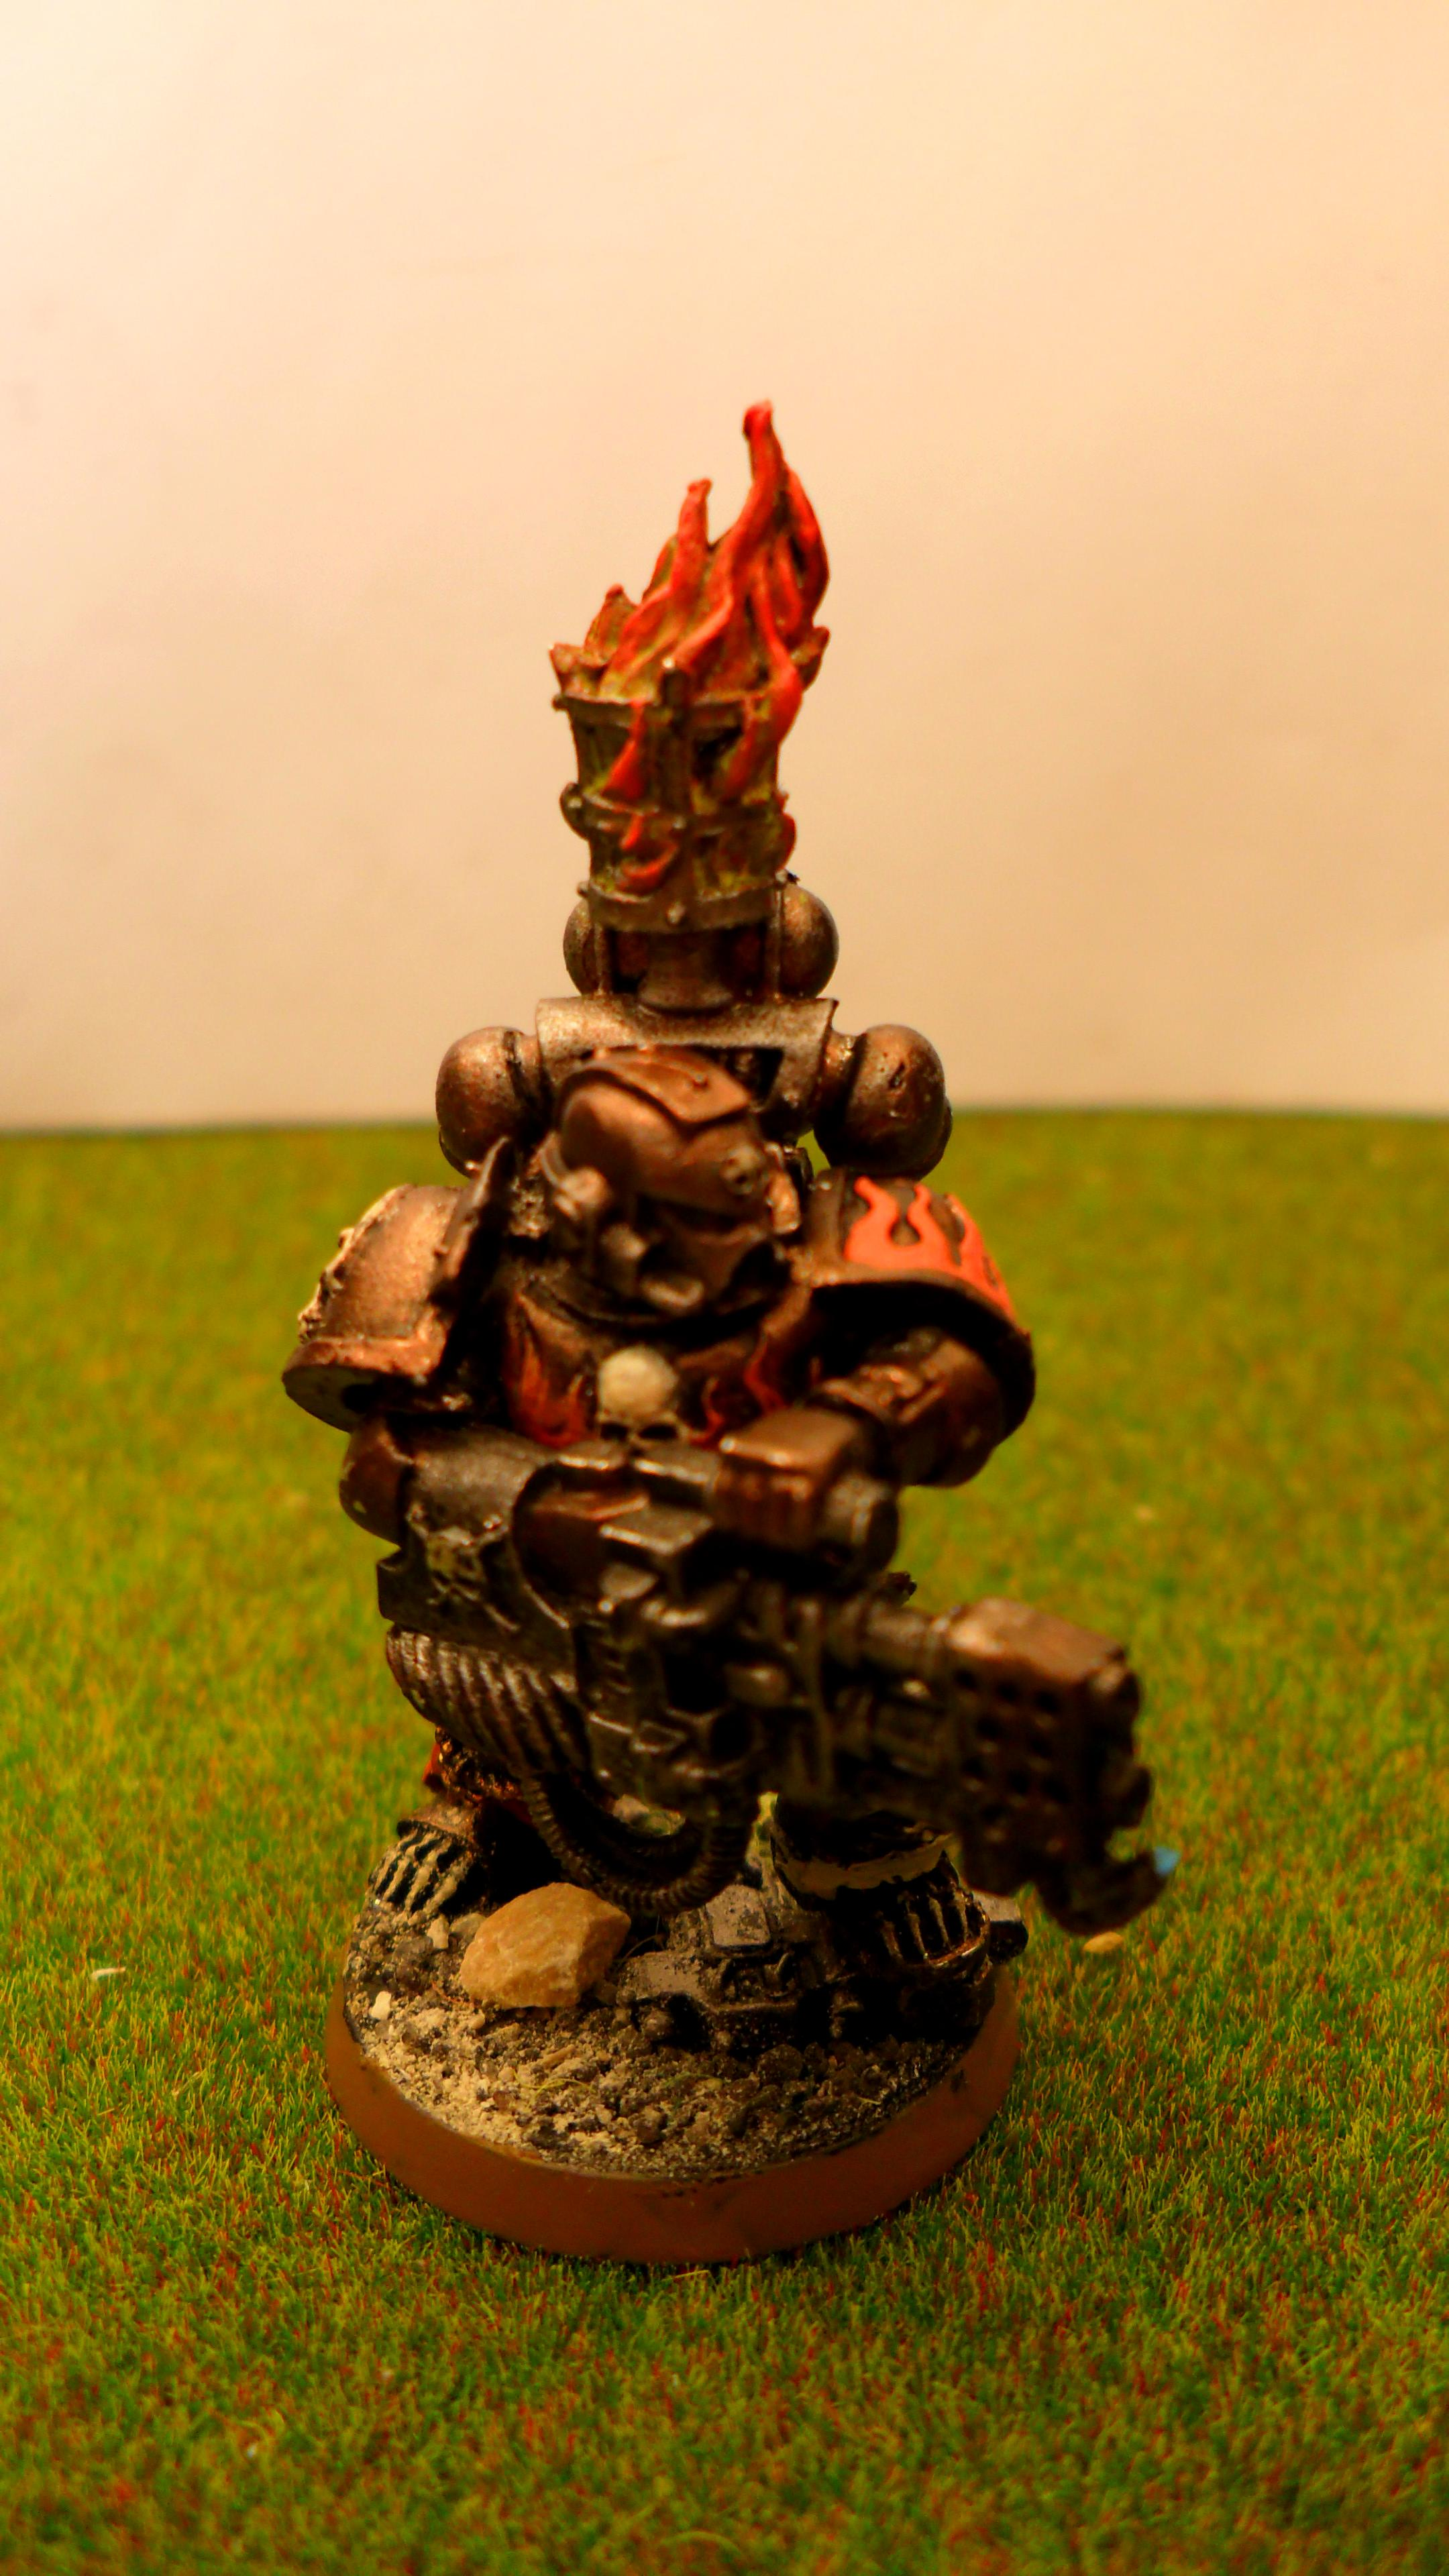 Legion Of The Damned, Pyromaniac, Salamander, Space Marines